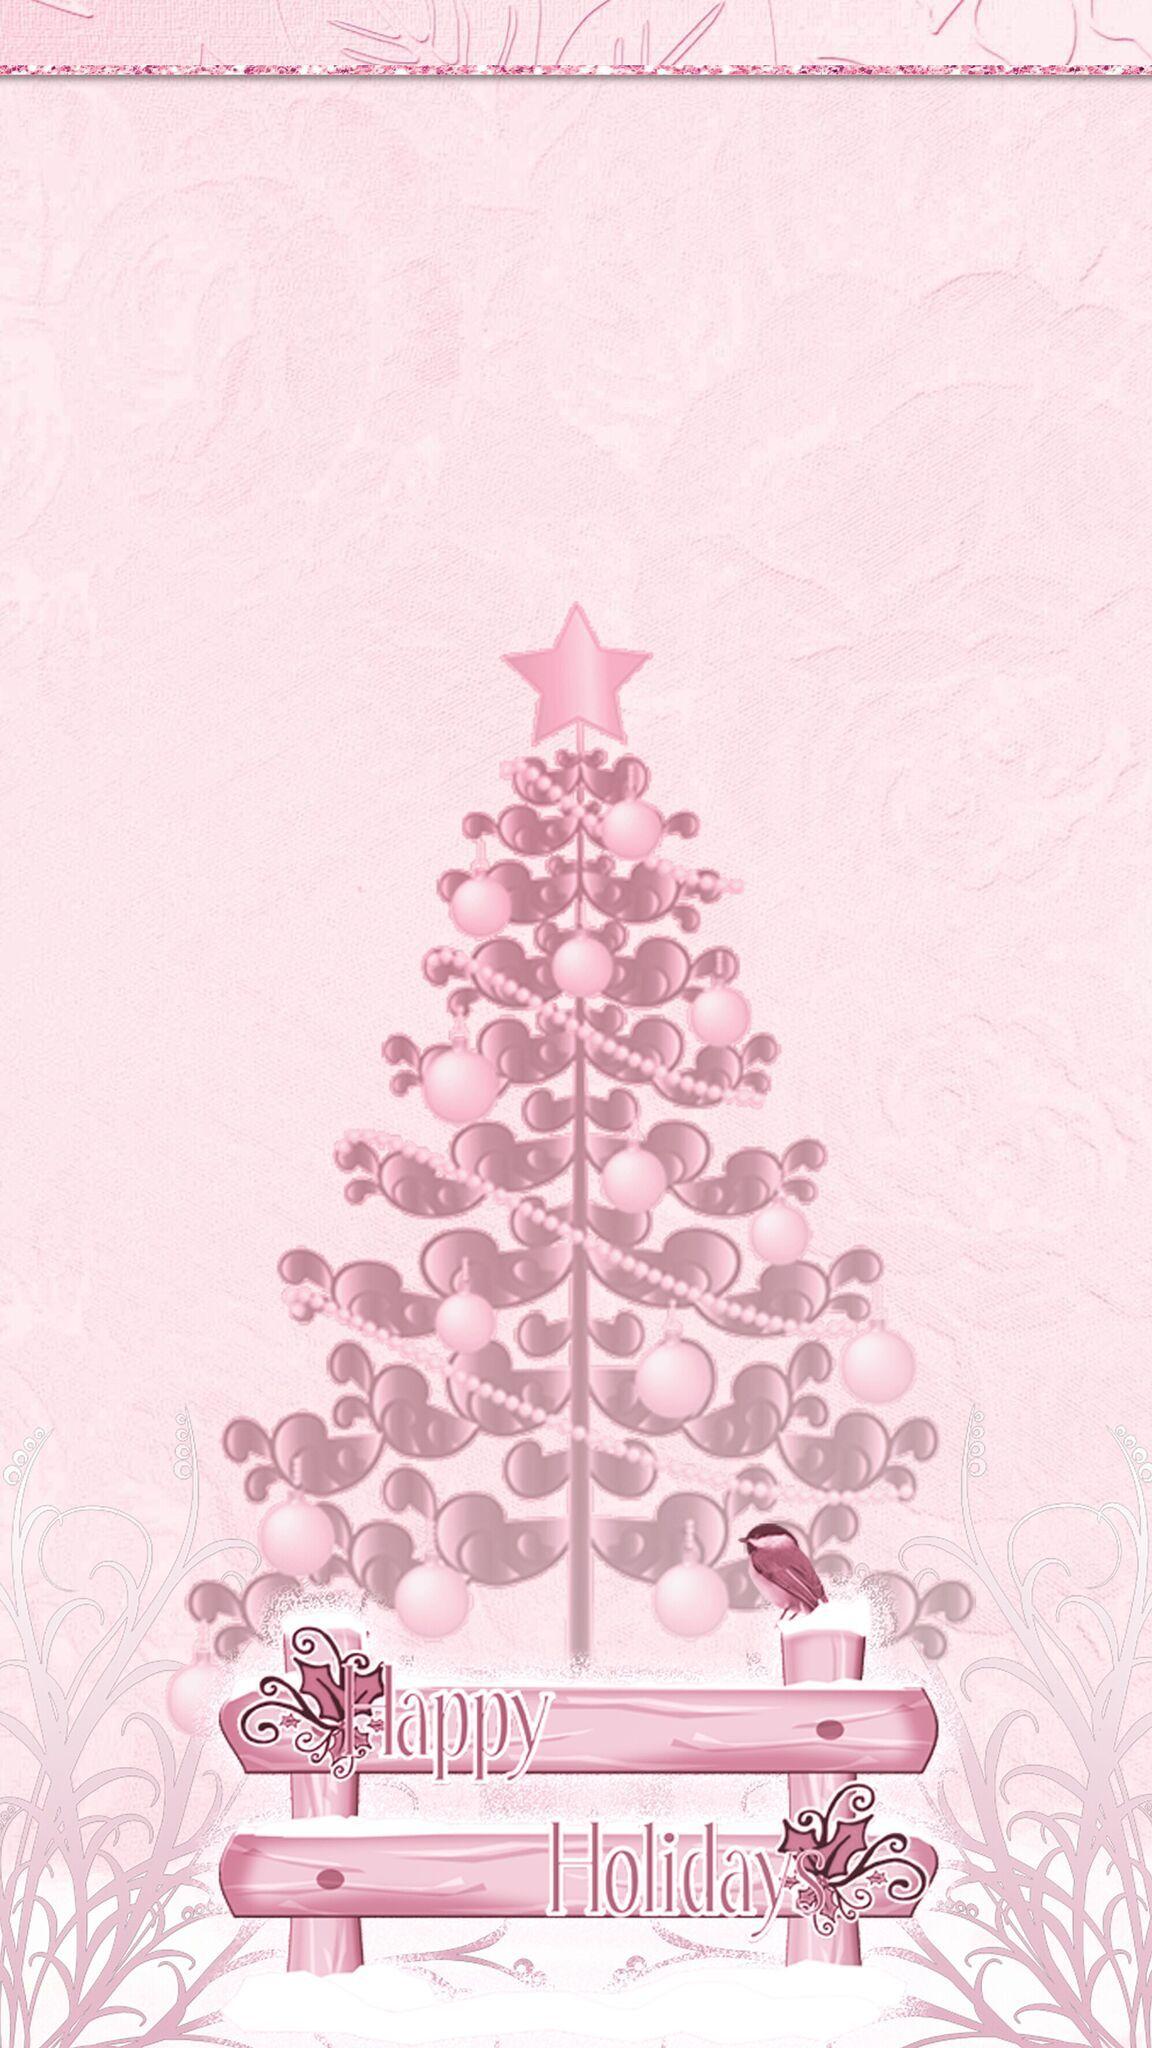 Iphone Wall Christmas Tjn Wallpaper Iphone Christmas Xmas Wallpaper Iphone Wallpaper For Guys